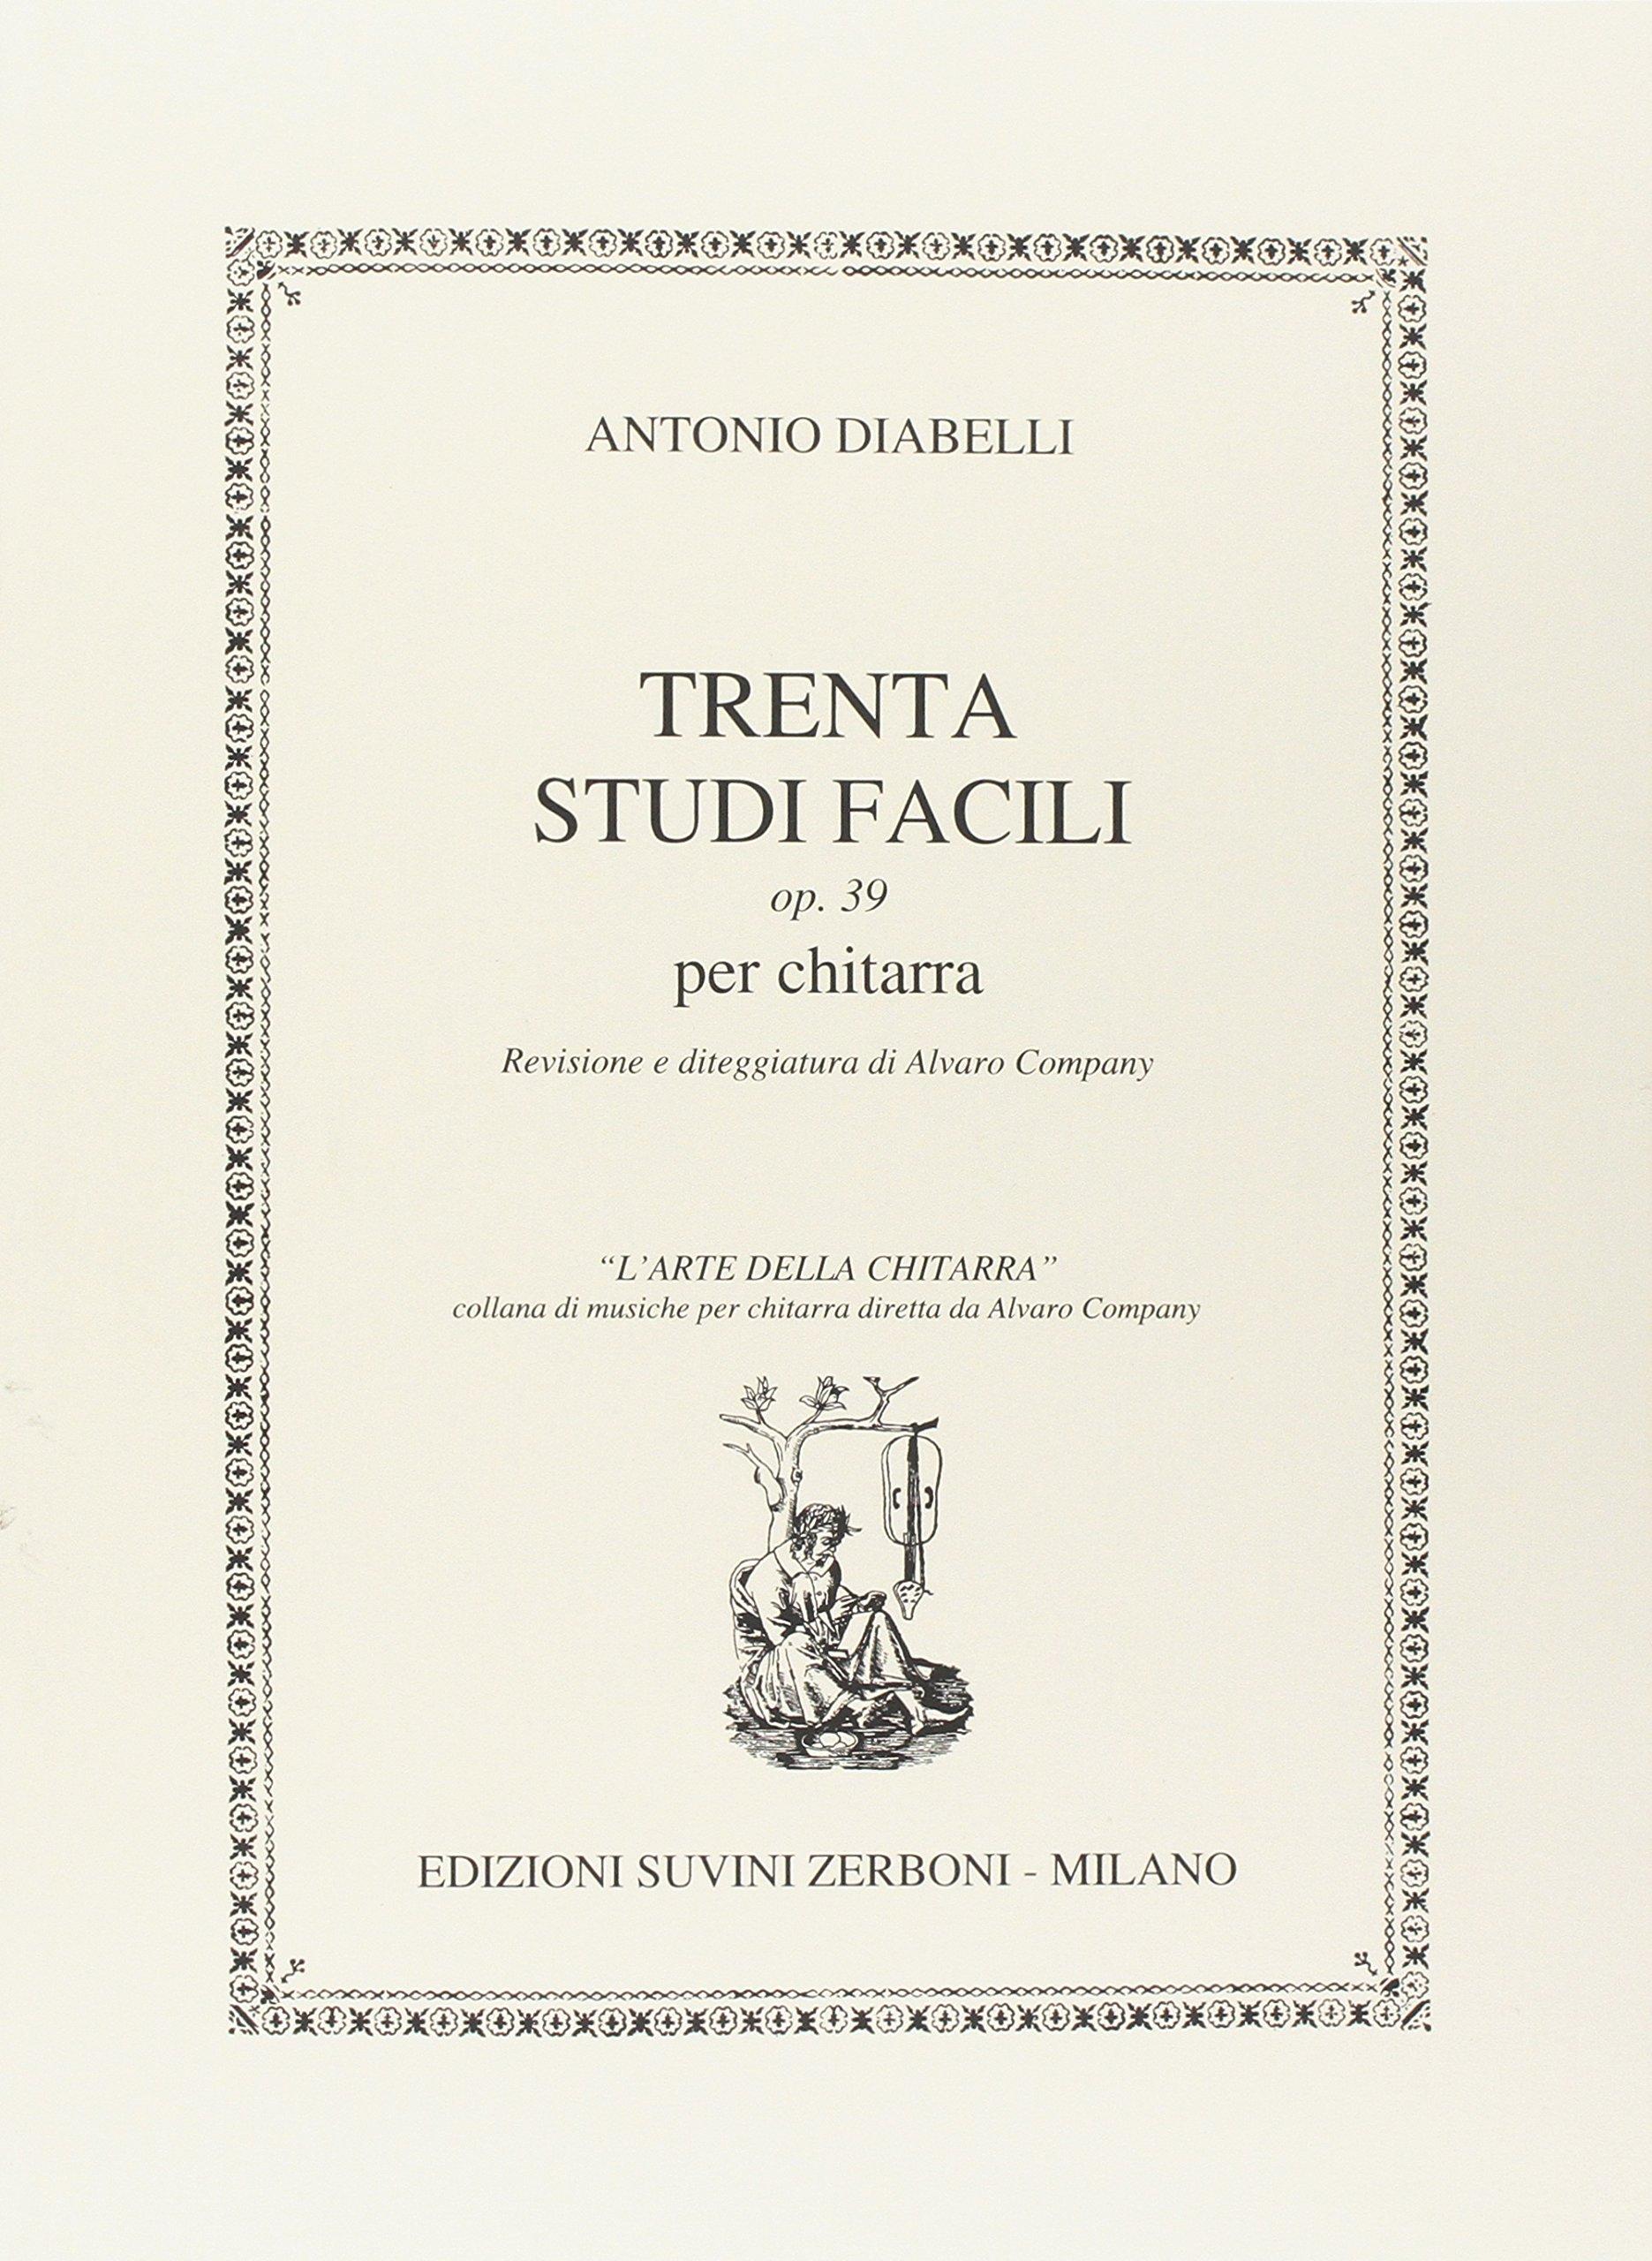 ESZ Trenta studi facili op.39 per chitarra - ANTONIO DIABELLI